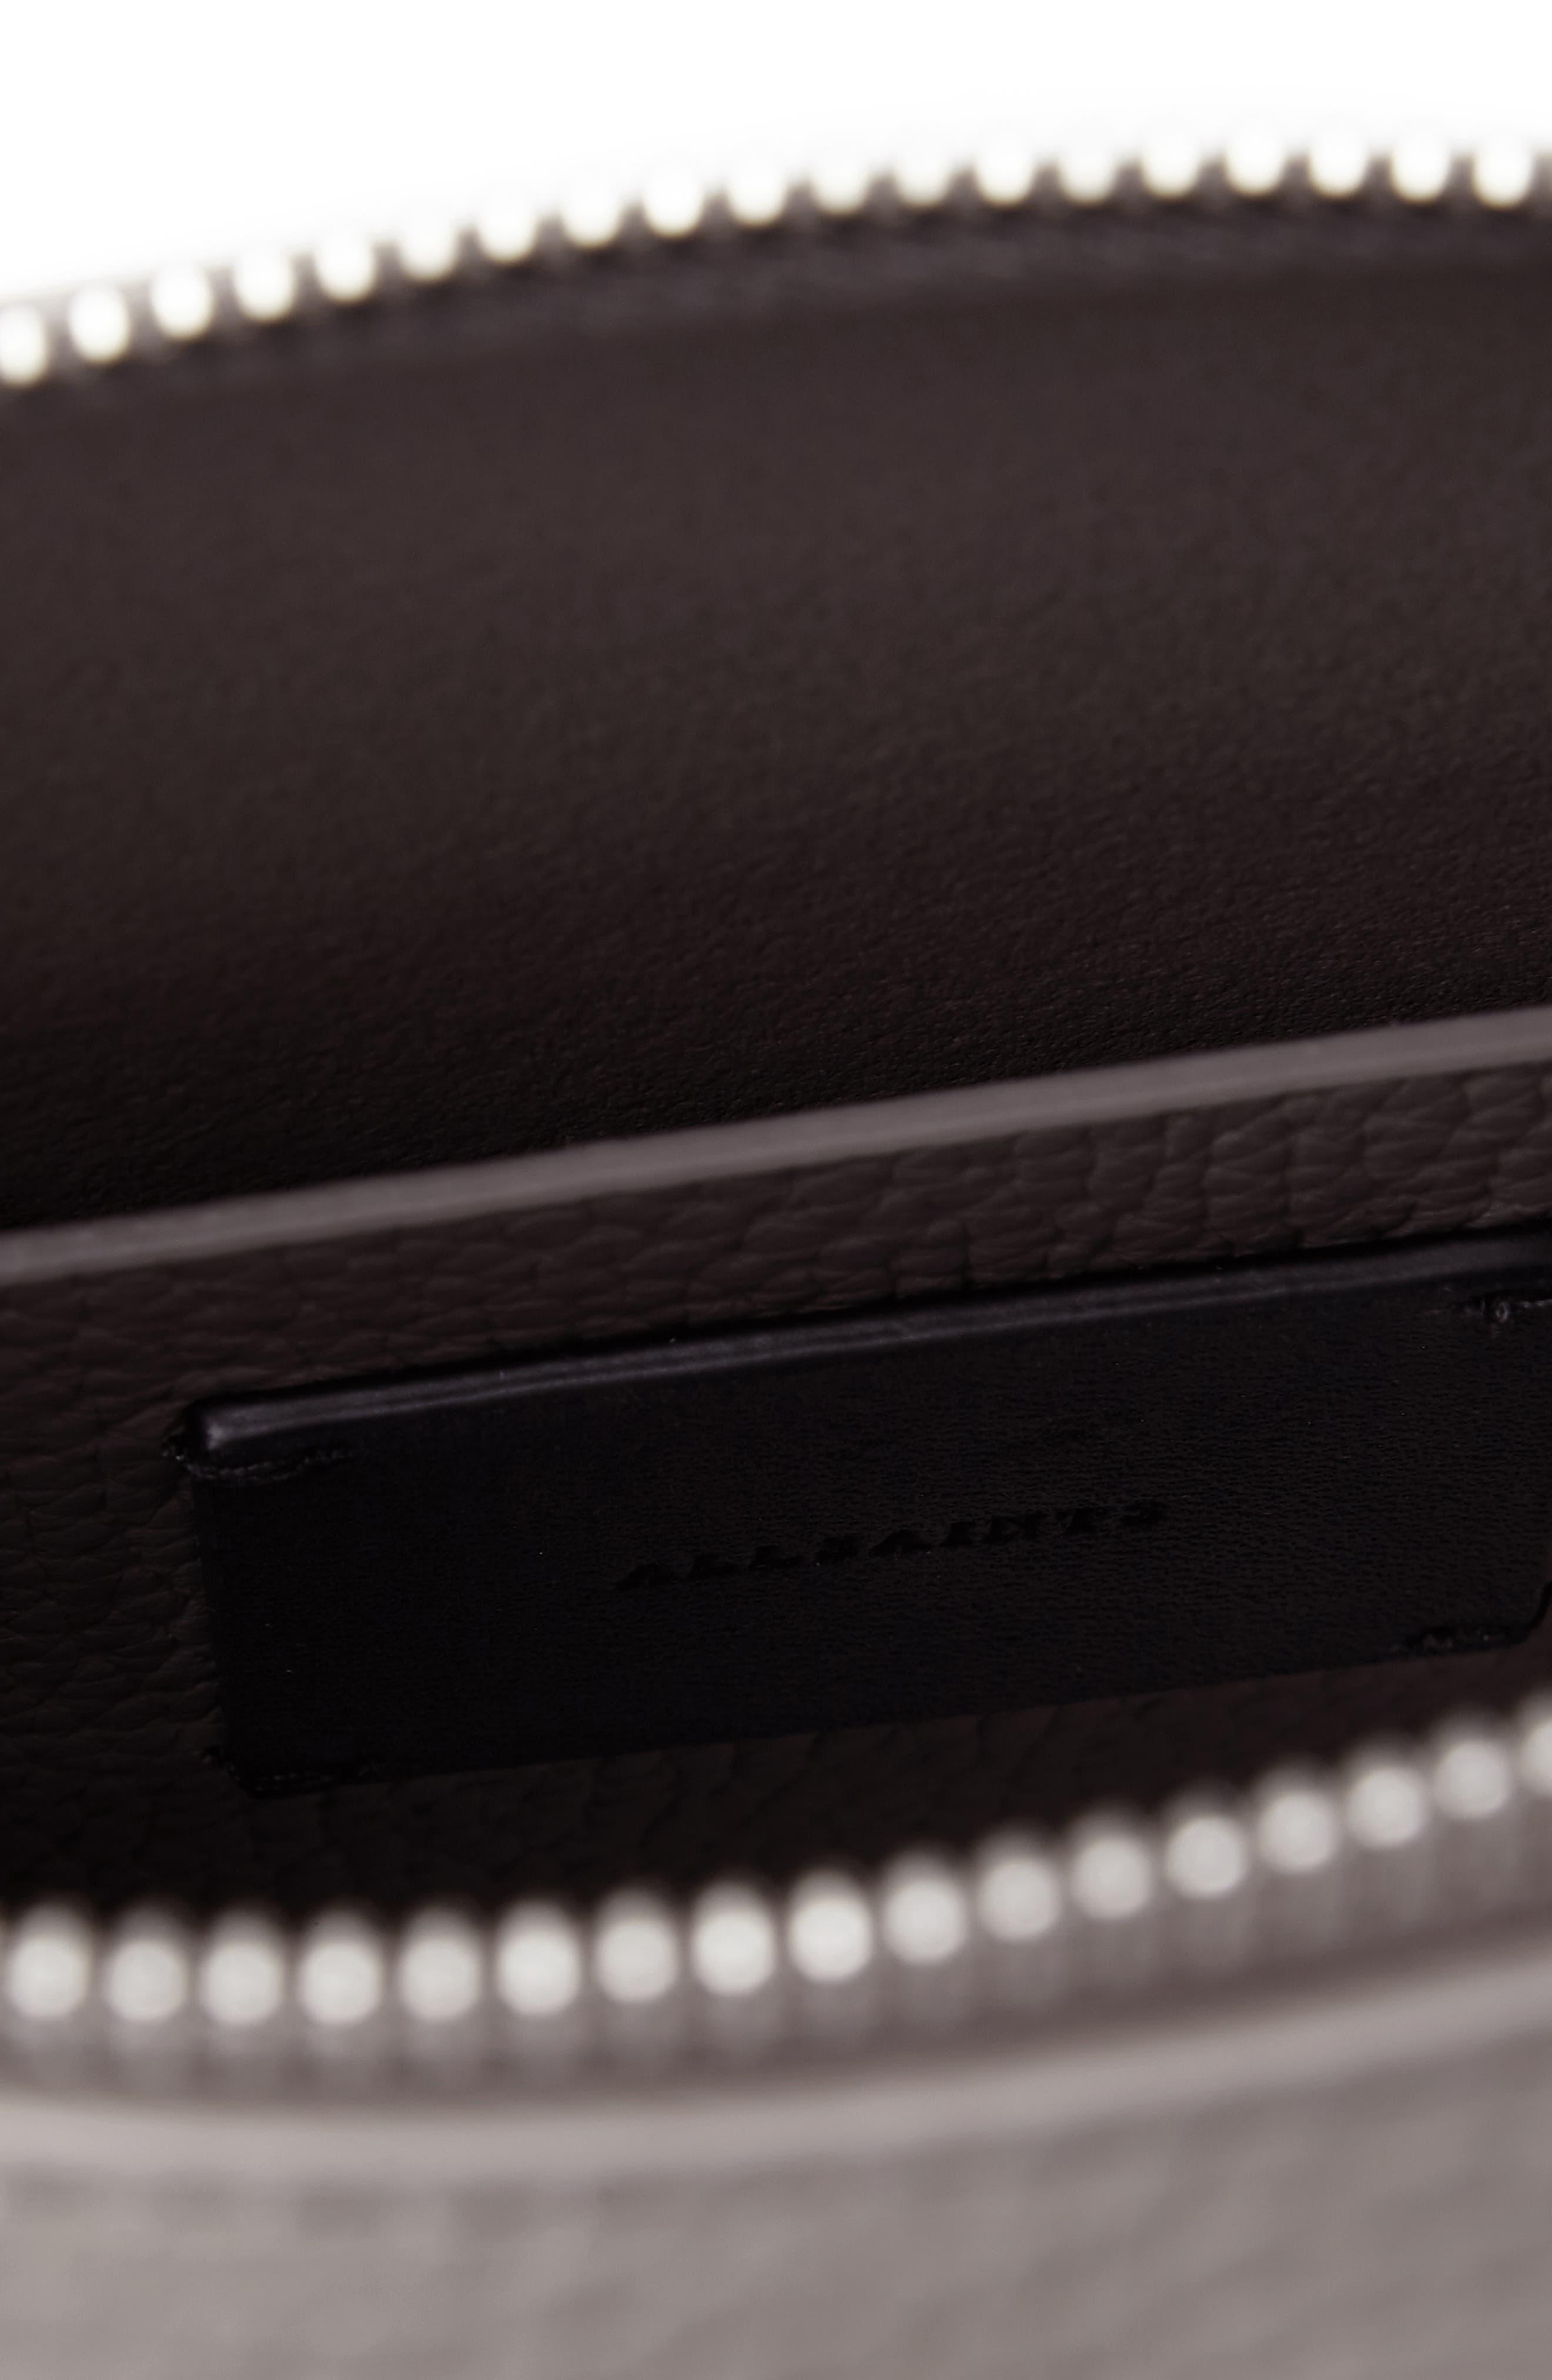 ALLSAINTS, 'Kita' Leather Shoulder/Crossbody Bag, Alternate thumbnail 4, color, STORM GREY